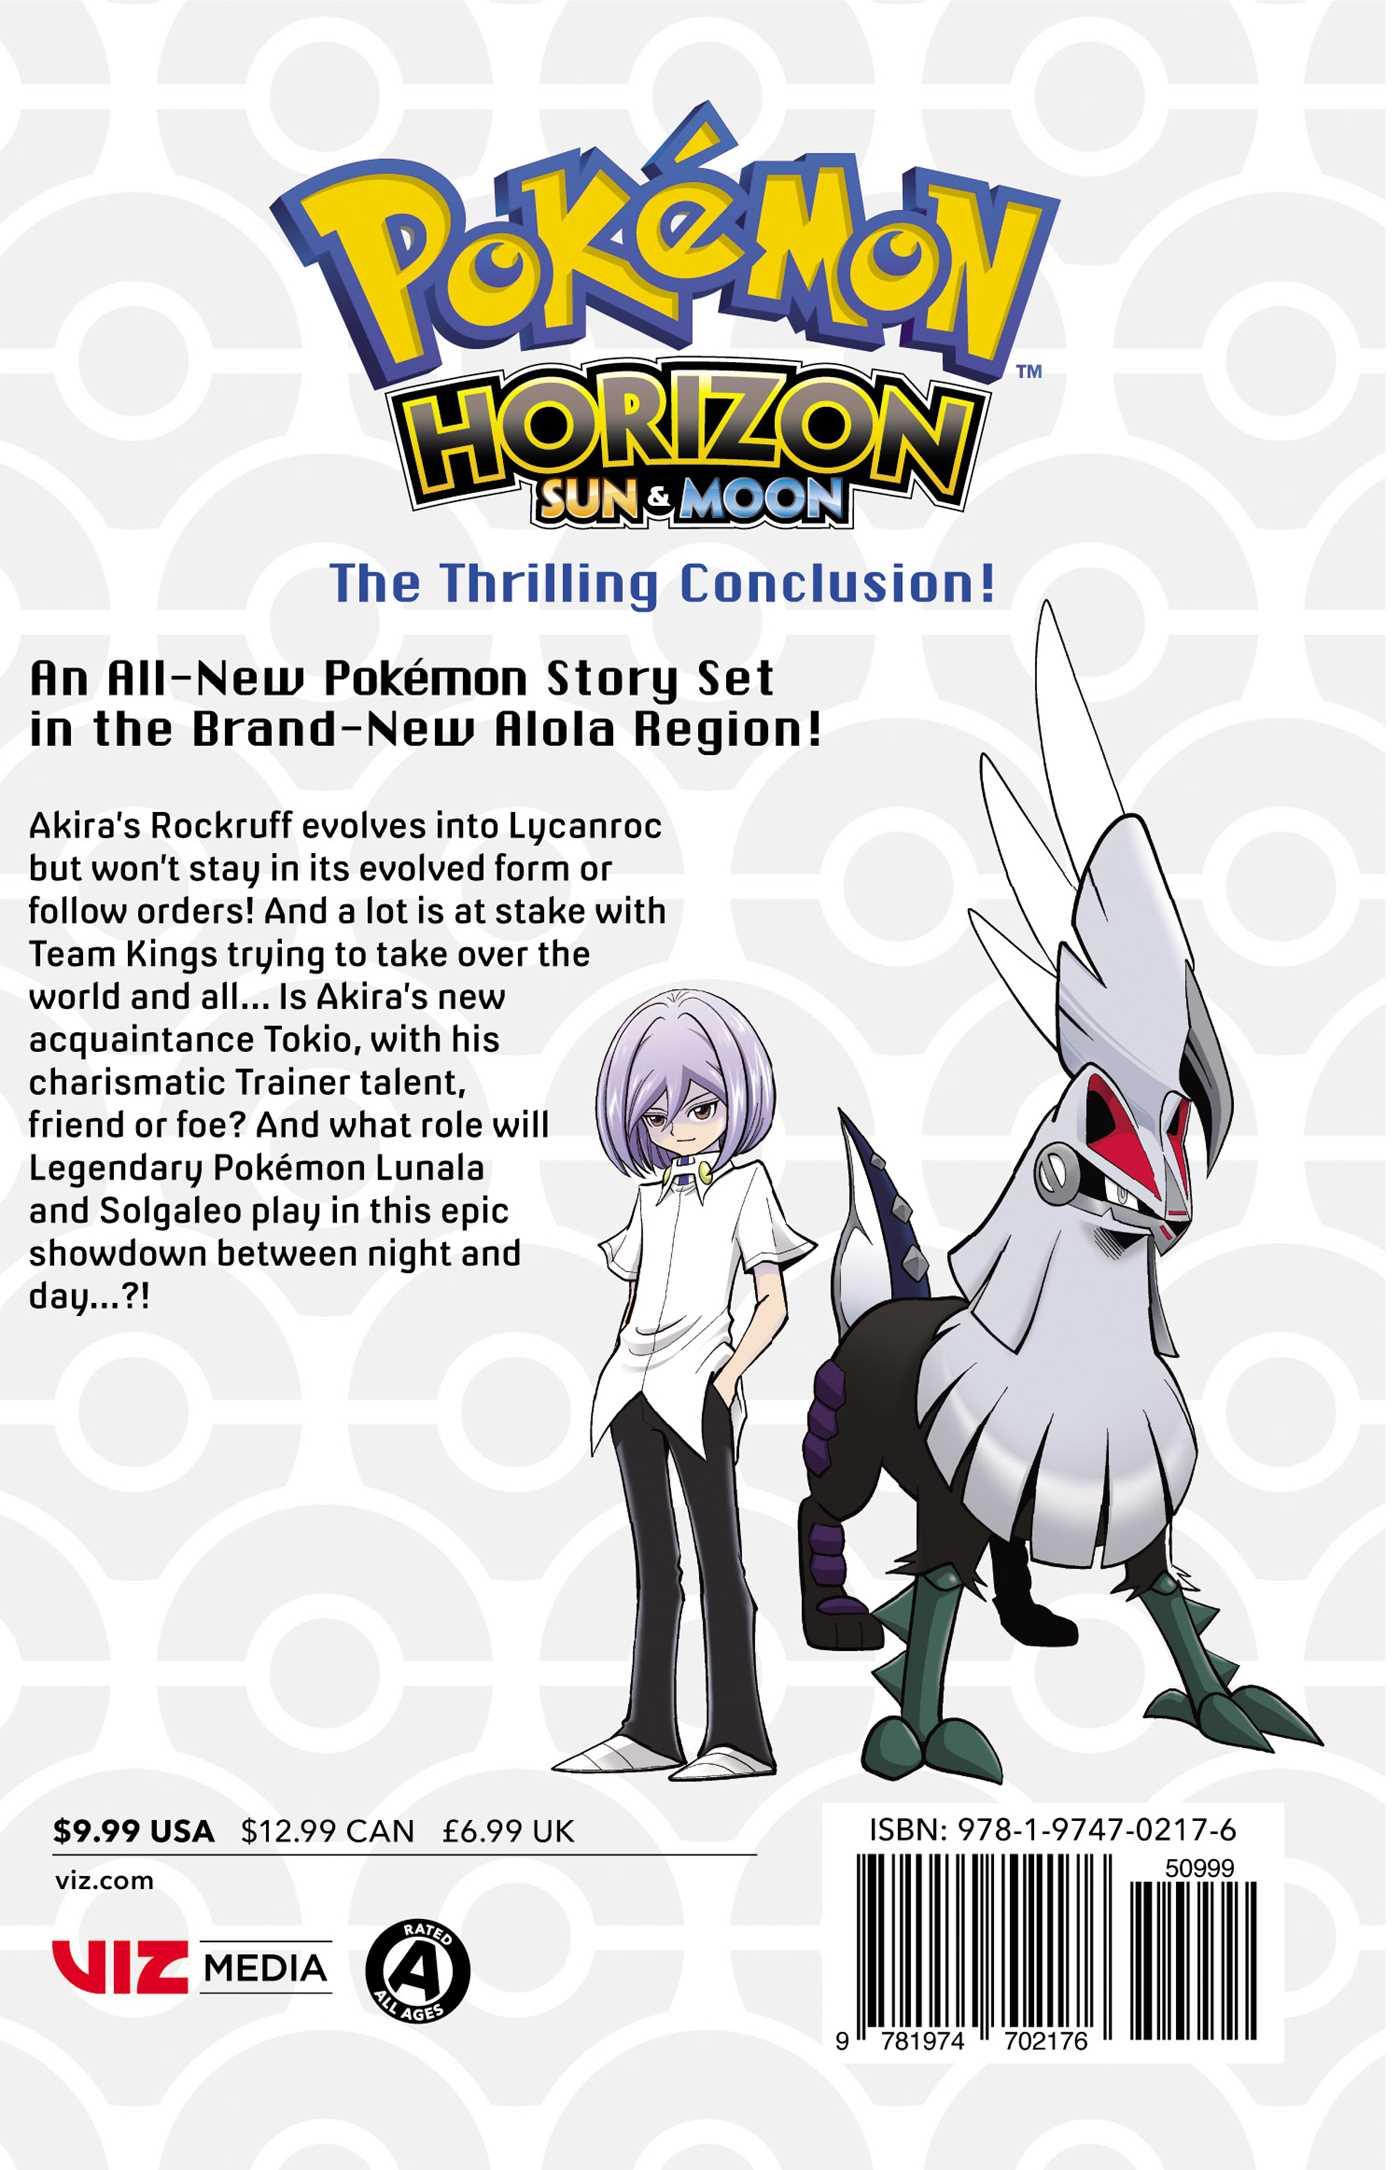 Pokemon horizon sun moon vol 2 9781974702176 hr back